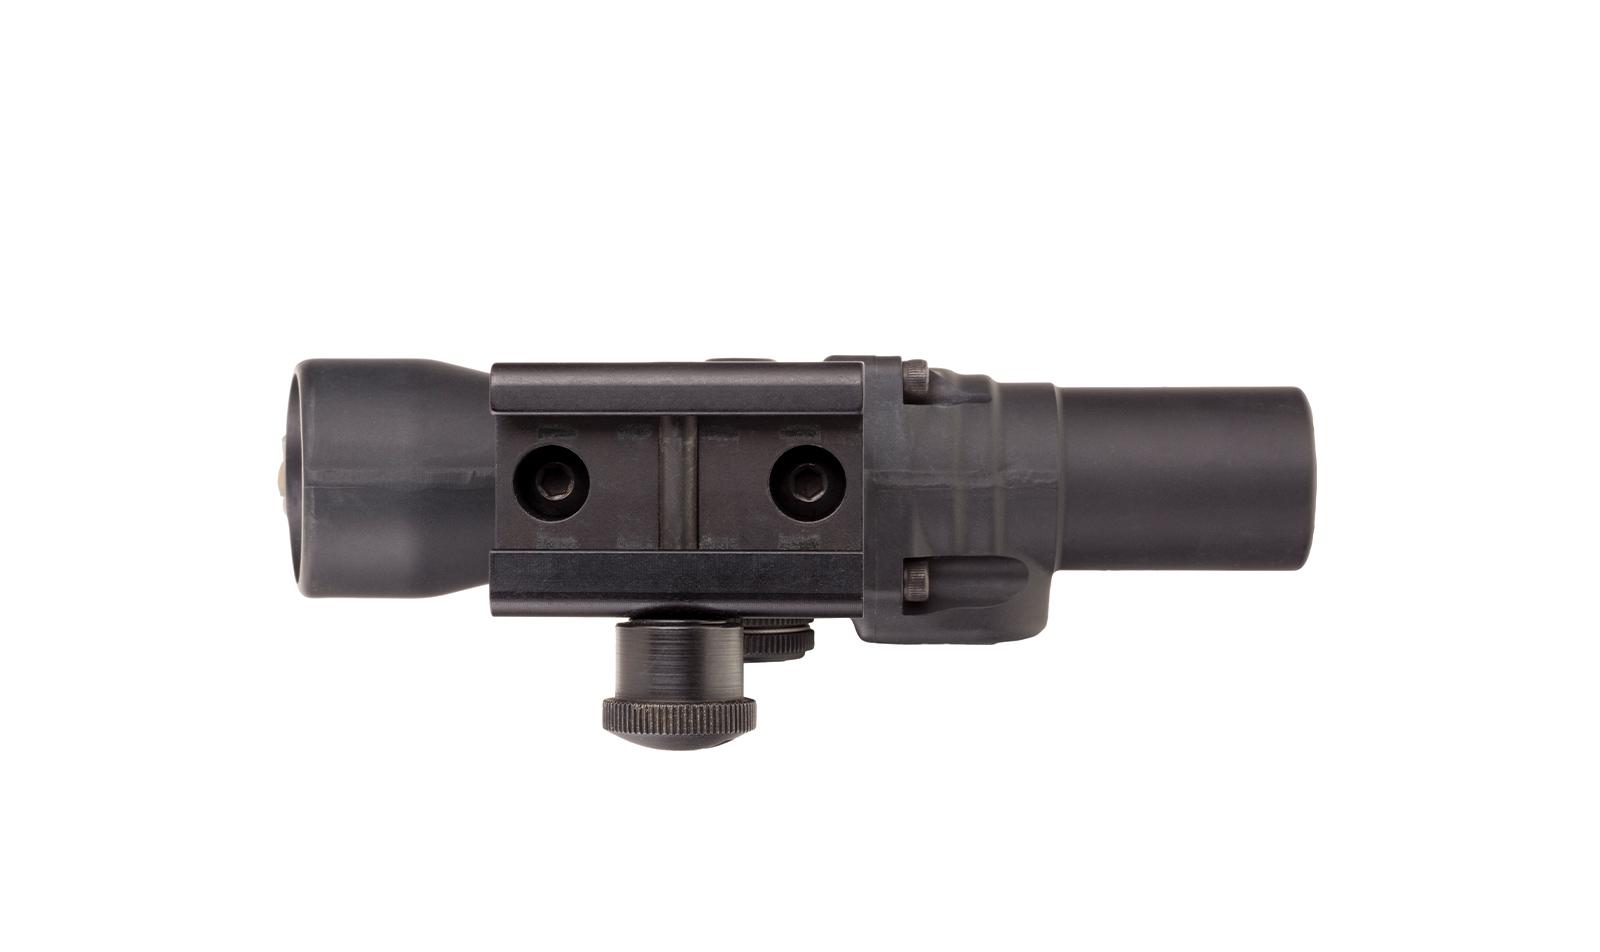 TA45-C-400157 angle 10